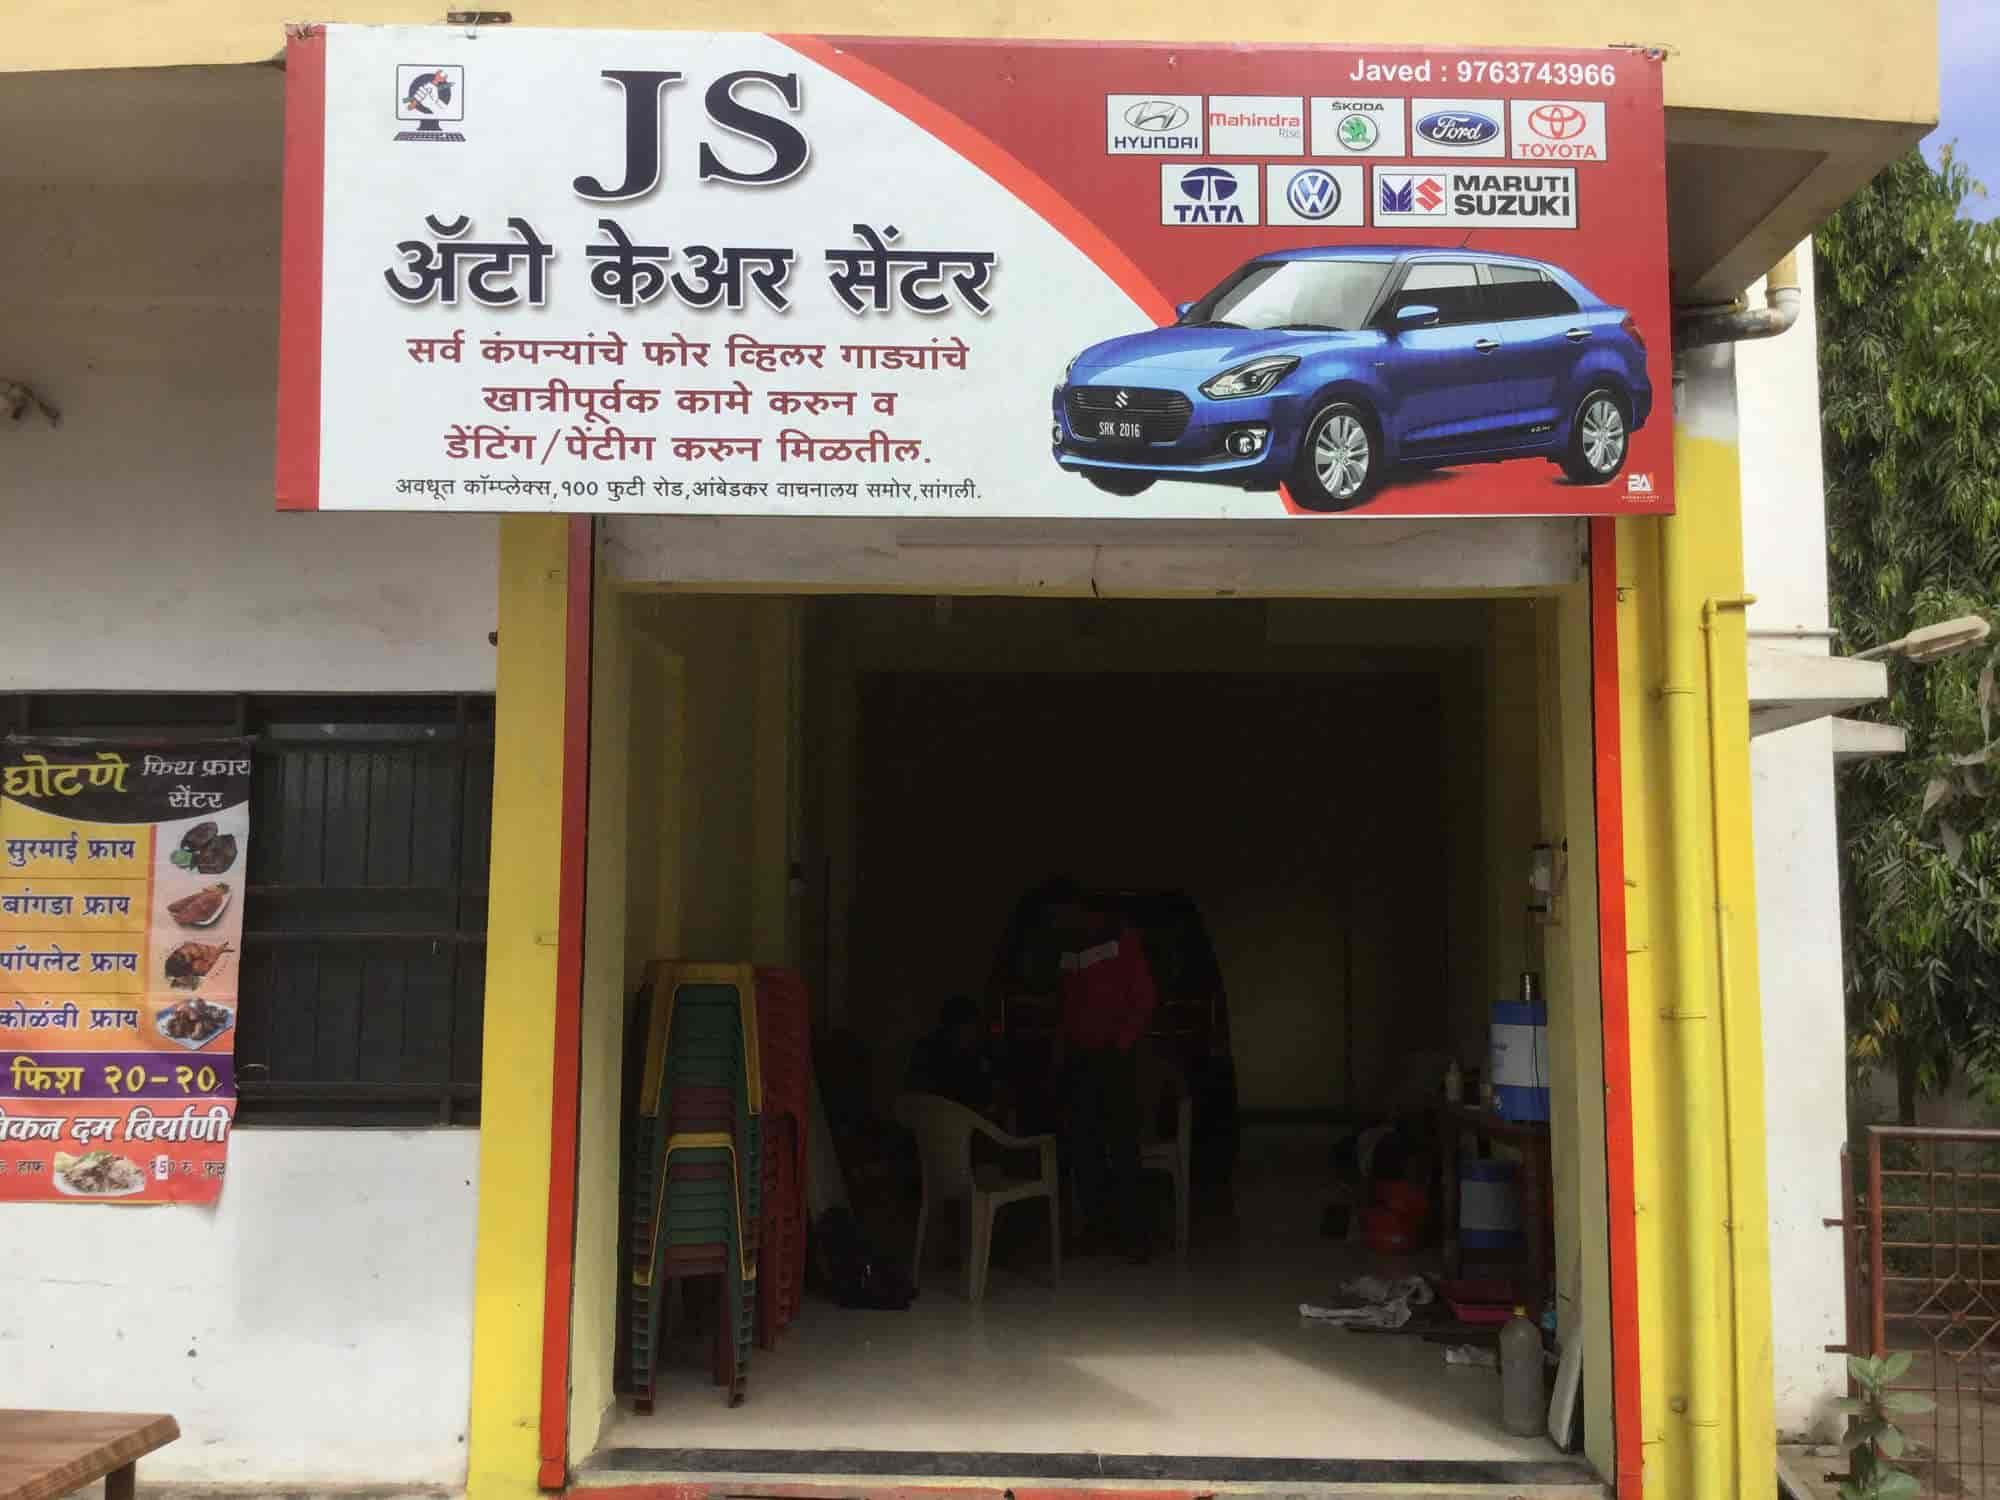 Auto Care Center >> J S Auto Care Center Photos Sangli Pictures Images Gallery